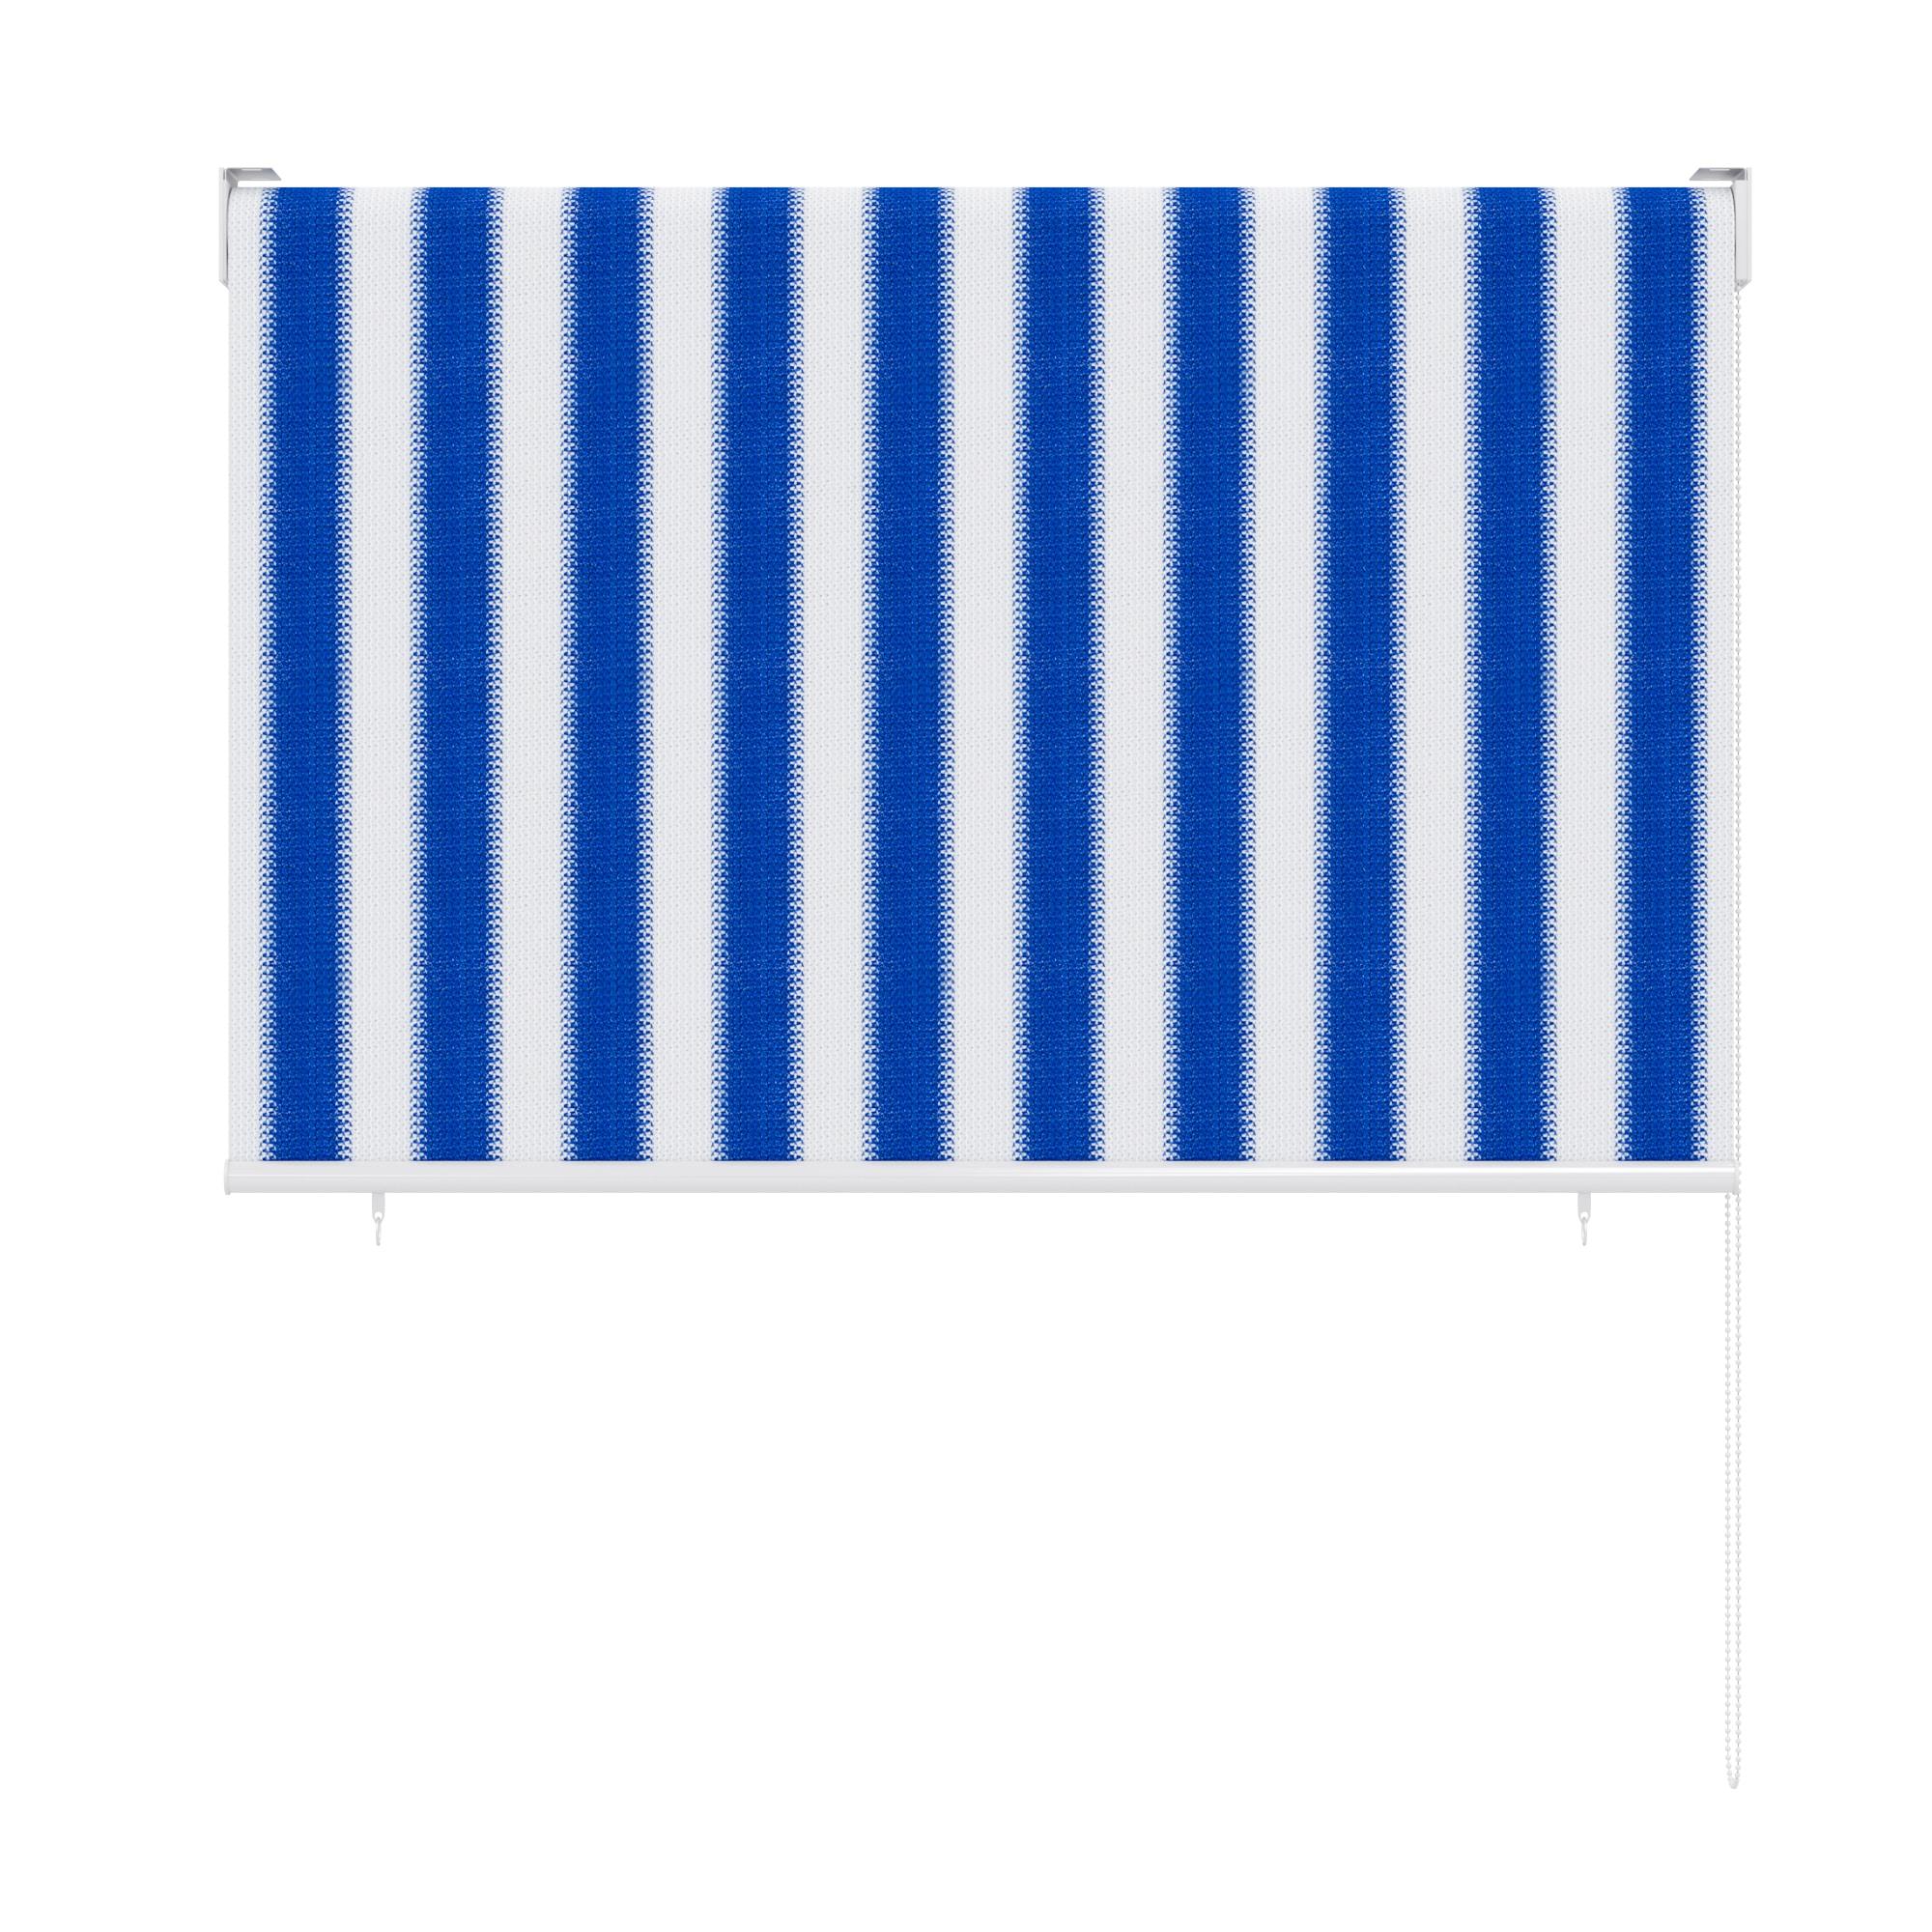 JAROLIFT-Senkrechtmarkise-Sichtschutz-Aussenrollo-Sonnenschutz-Aussen-Rollo-Balkon Indexbild 19